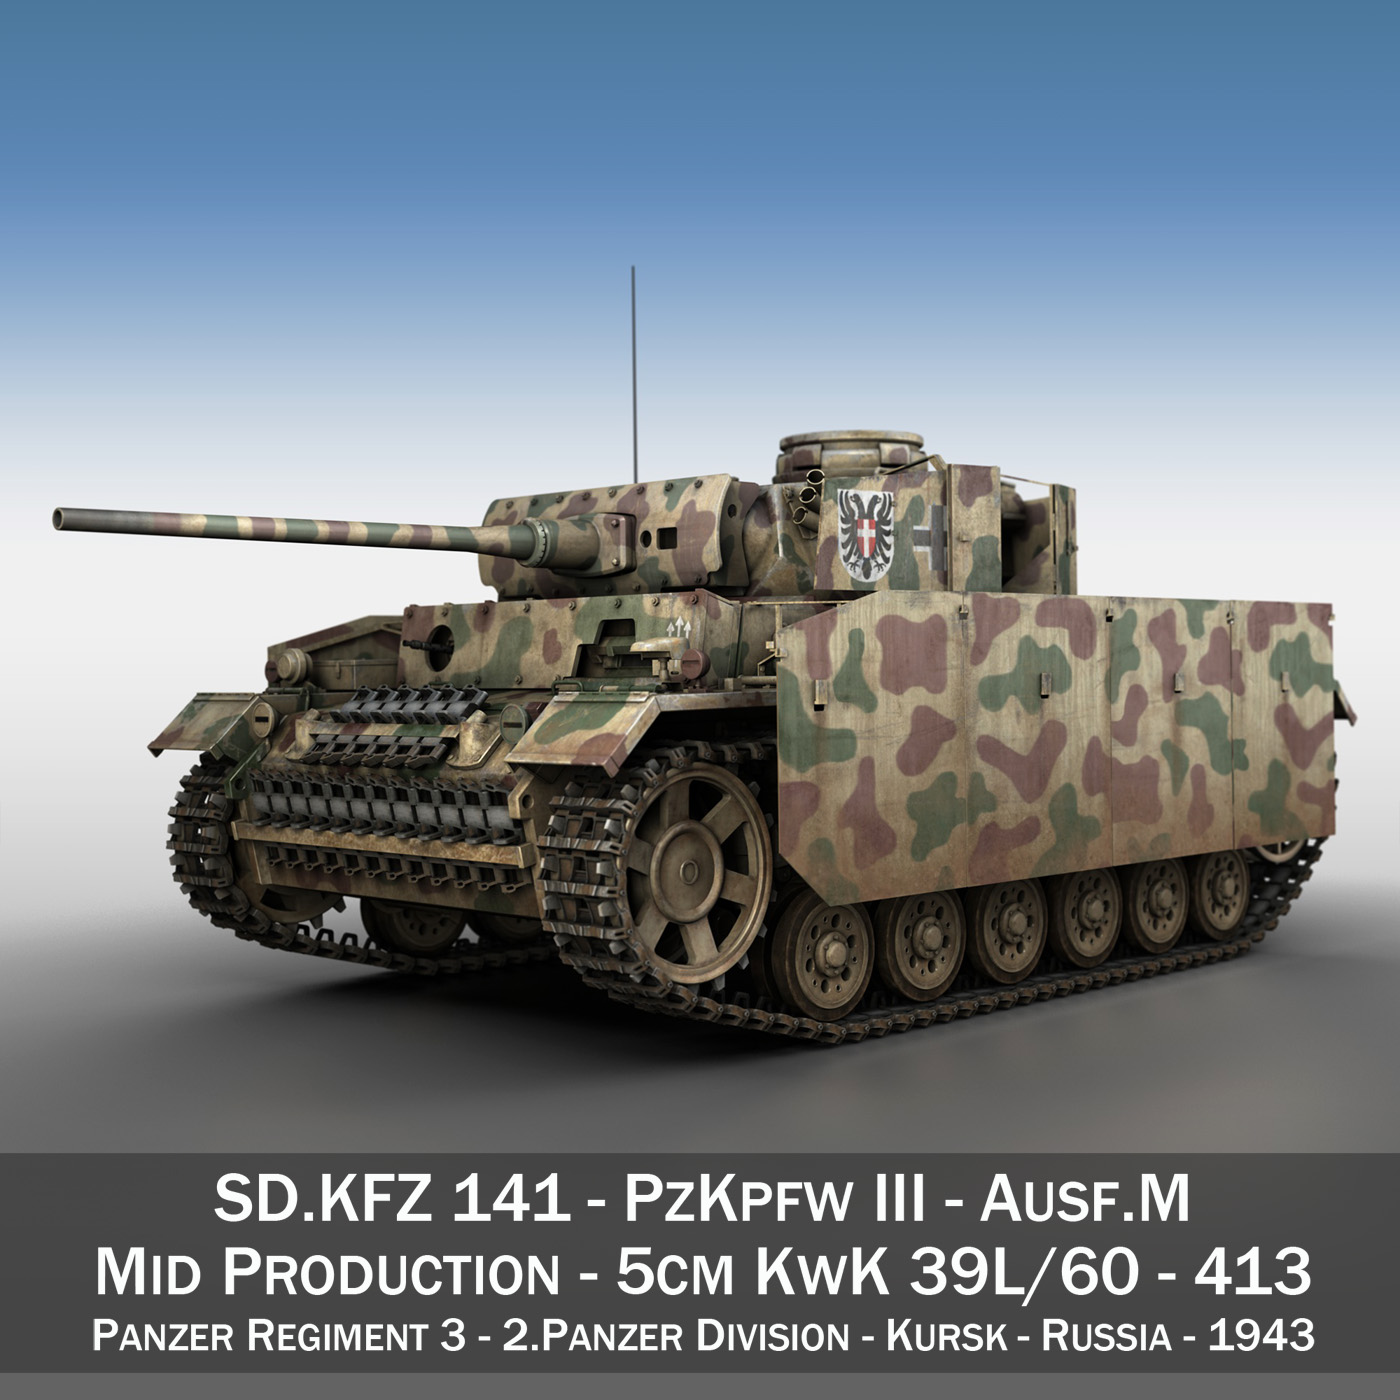 pzkpfw iii – panzer 3 – ausf.m – 413 3d model 3ds c4d lwo obj 269364